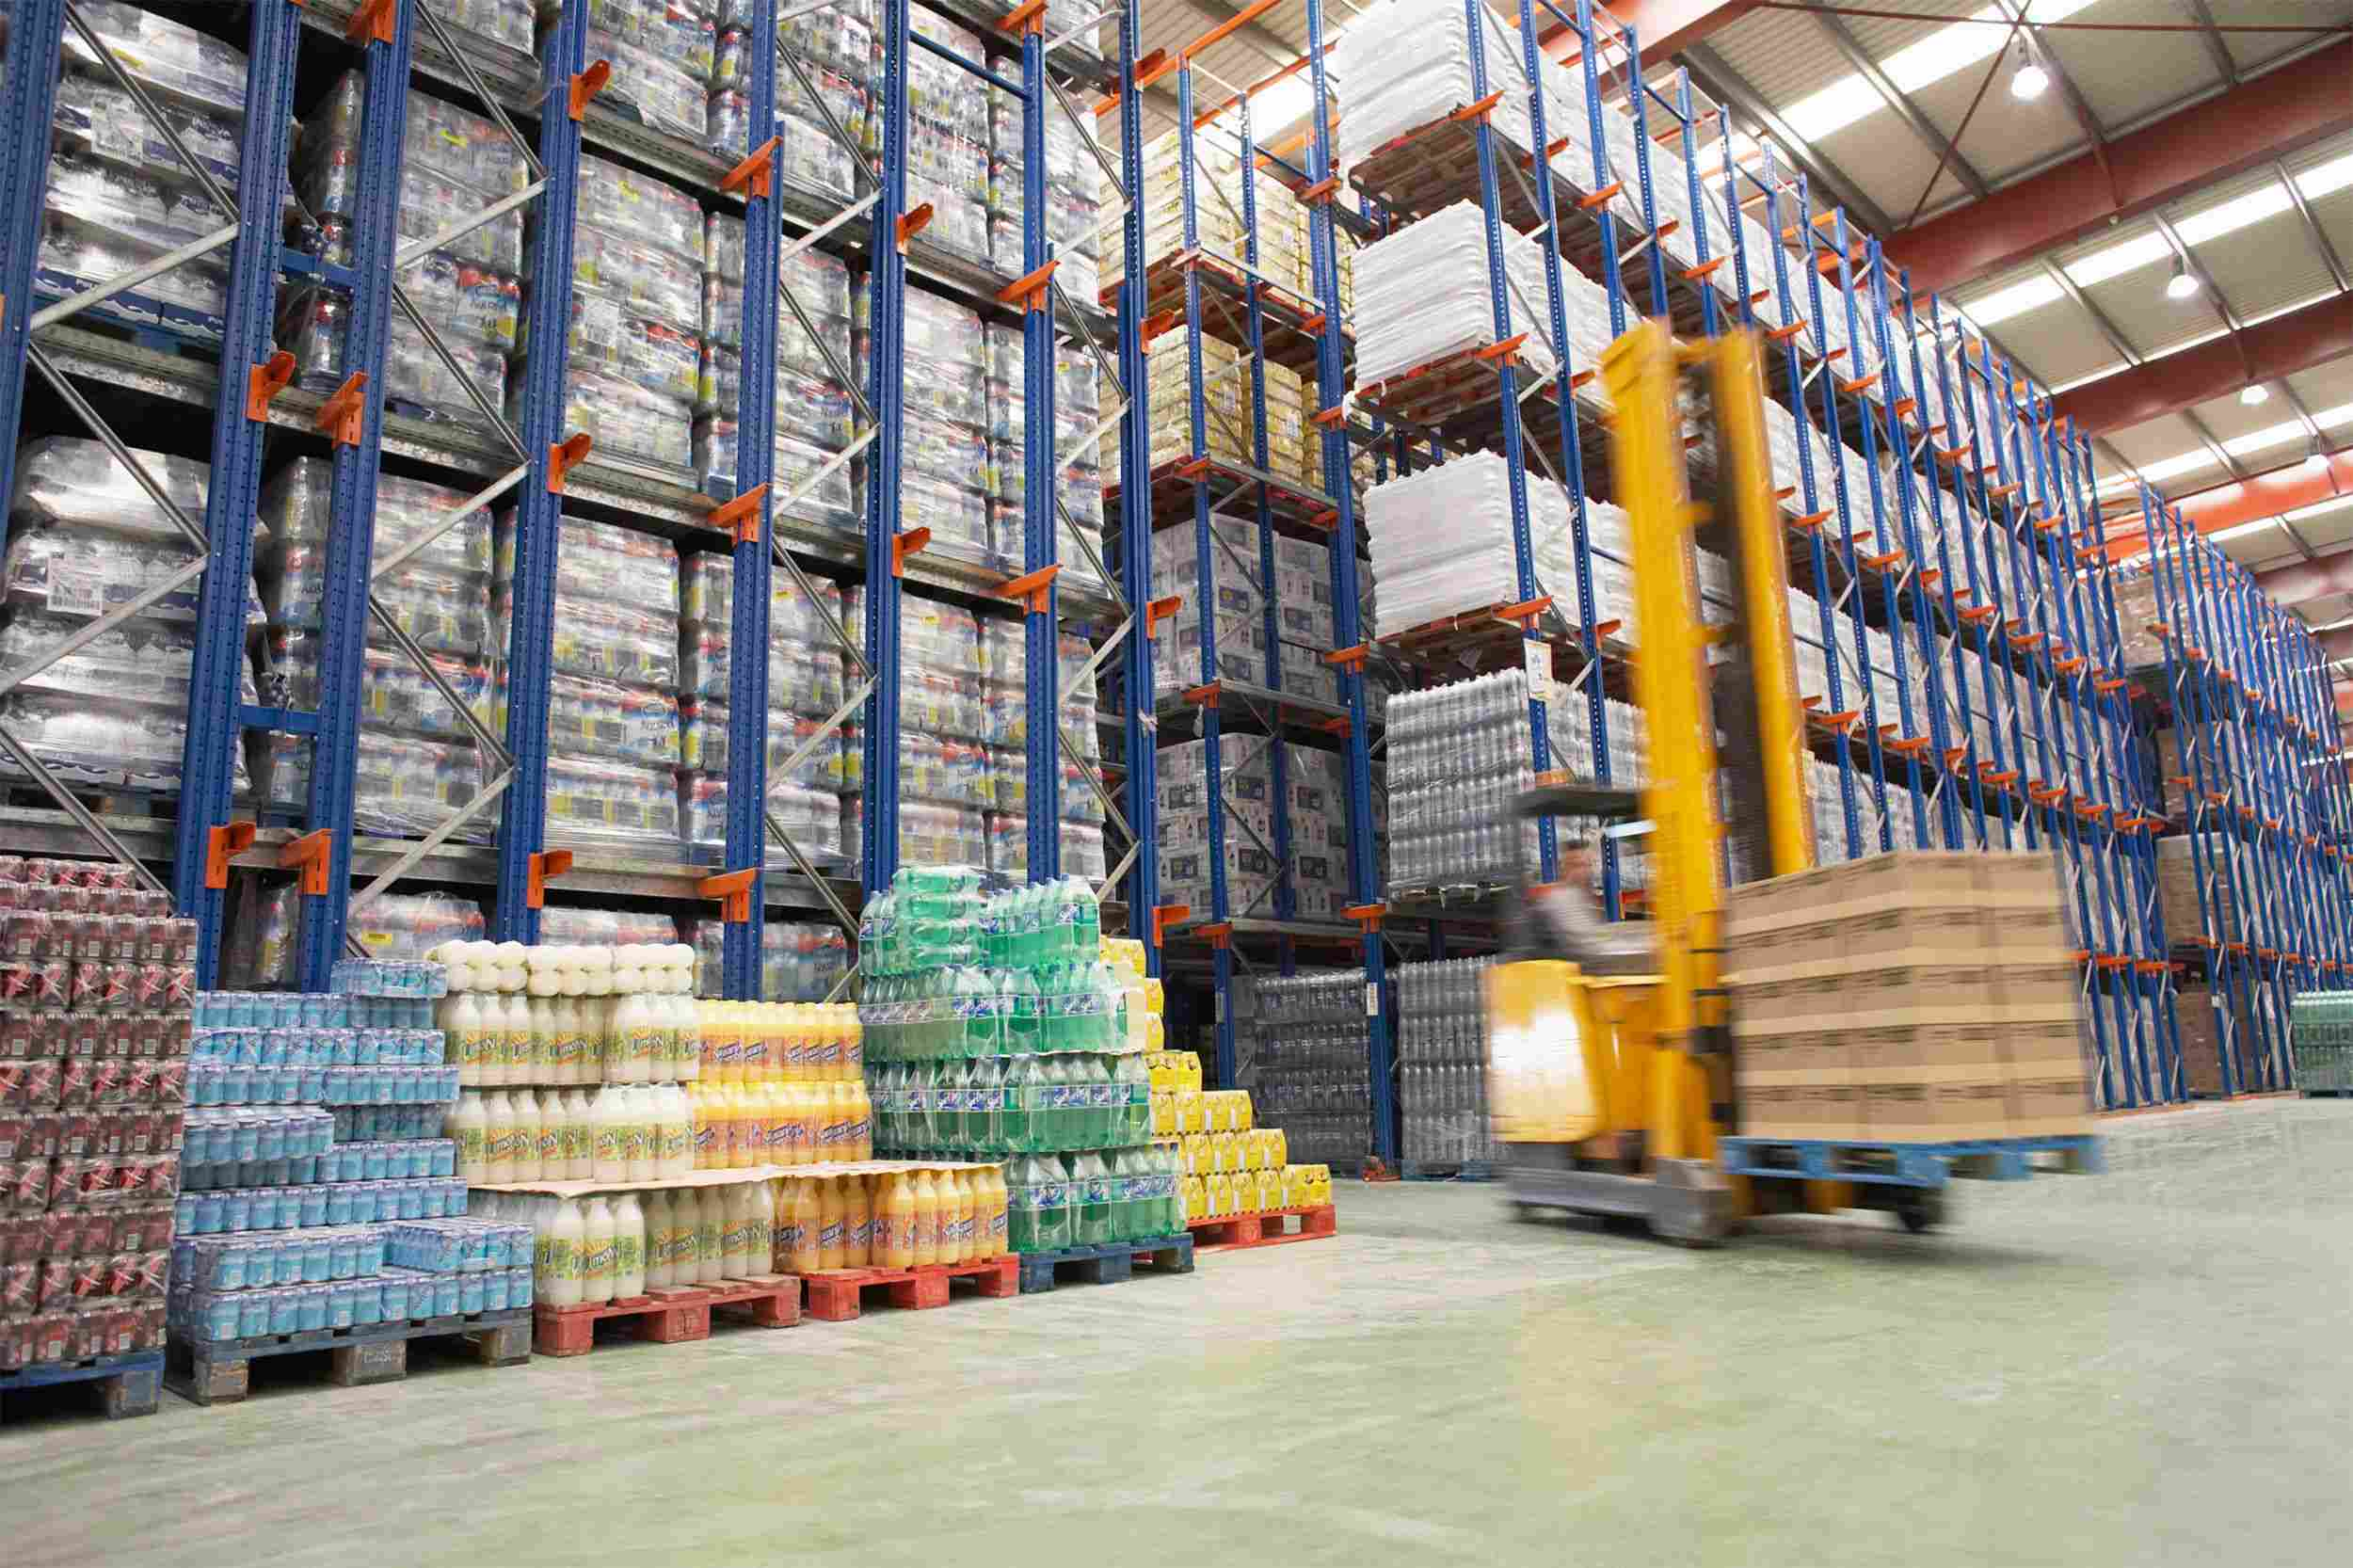 https://aubry-logistique.fr/wp-content/uploads/2015/09/Warehouse-and-lifter.jpg